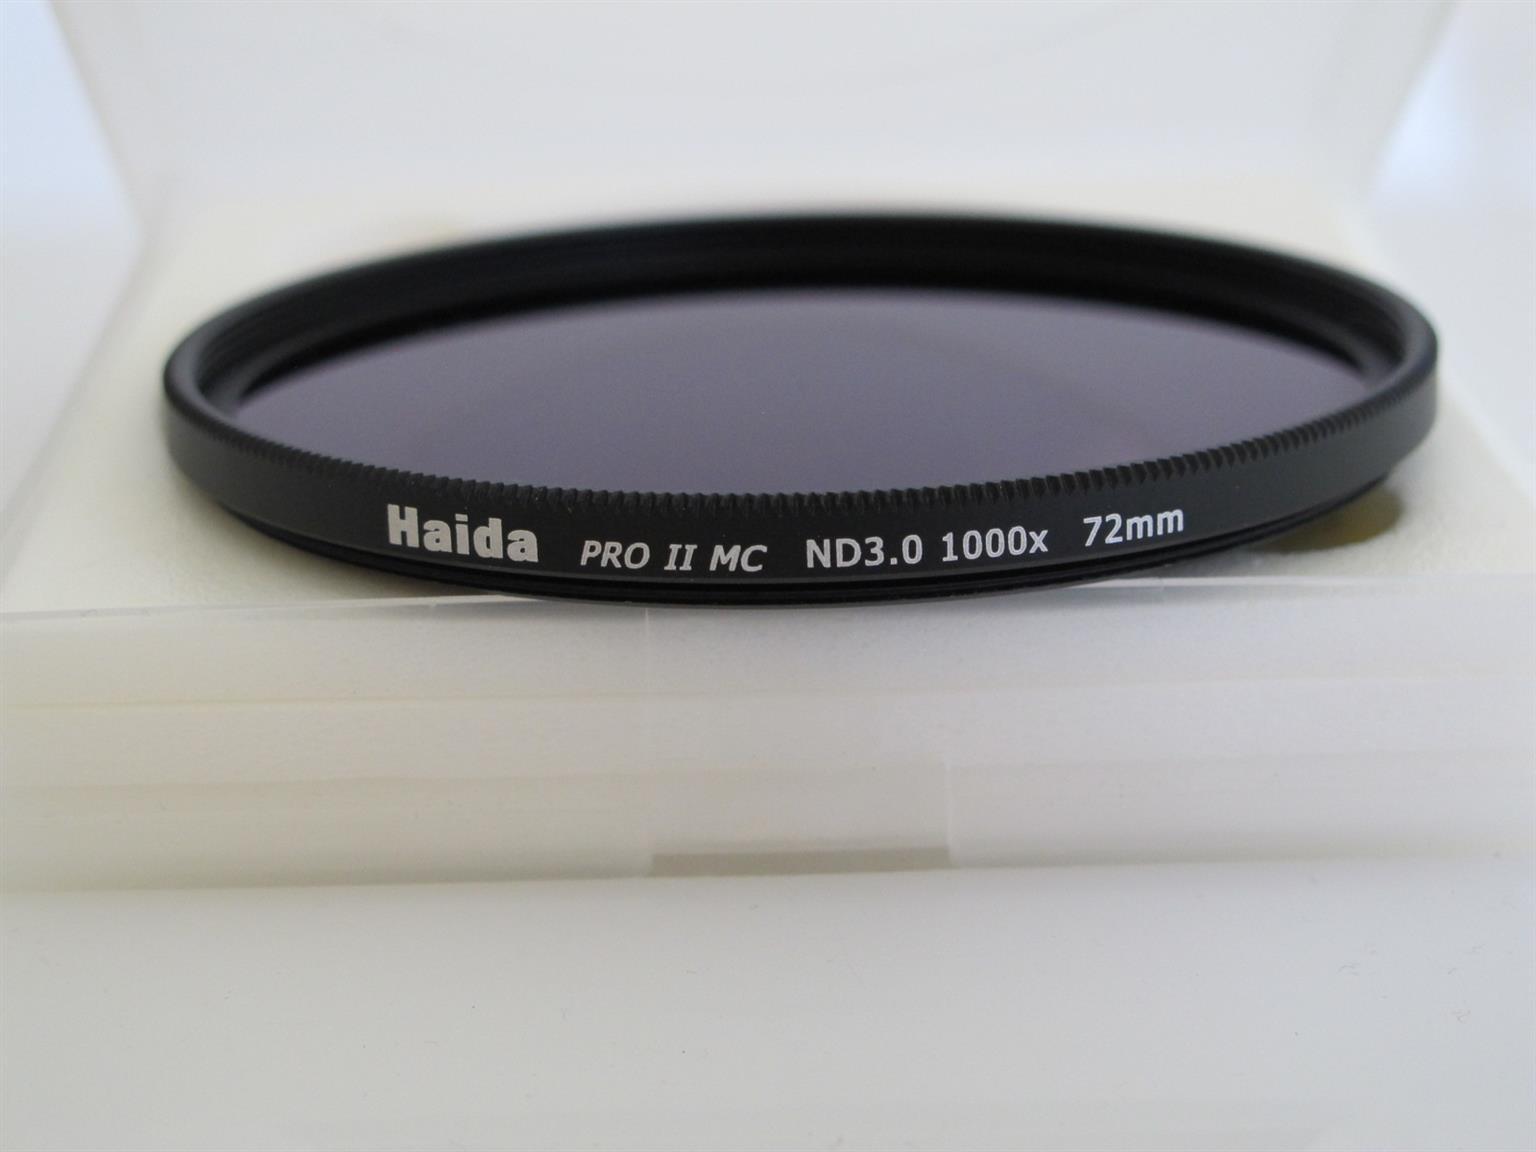 Haida PRO-II Multi-Coated | ND3.0 | 10-Stop | Screw-in Neutral Density ND Filter